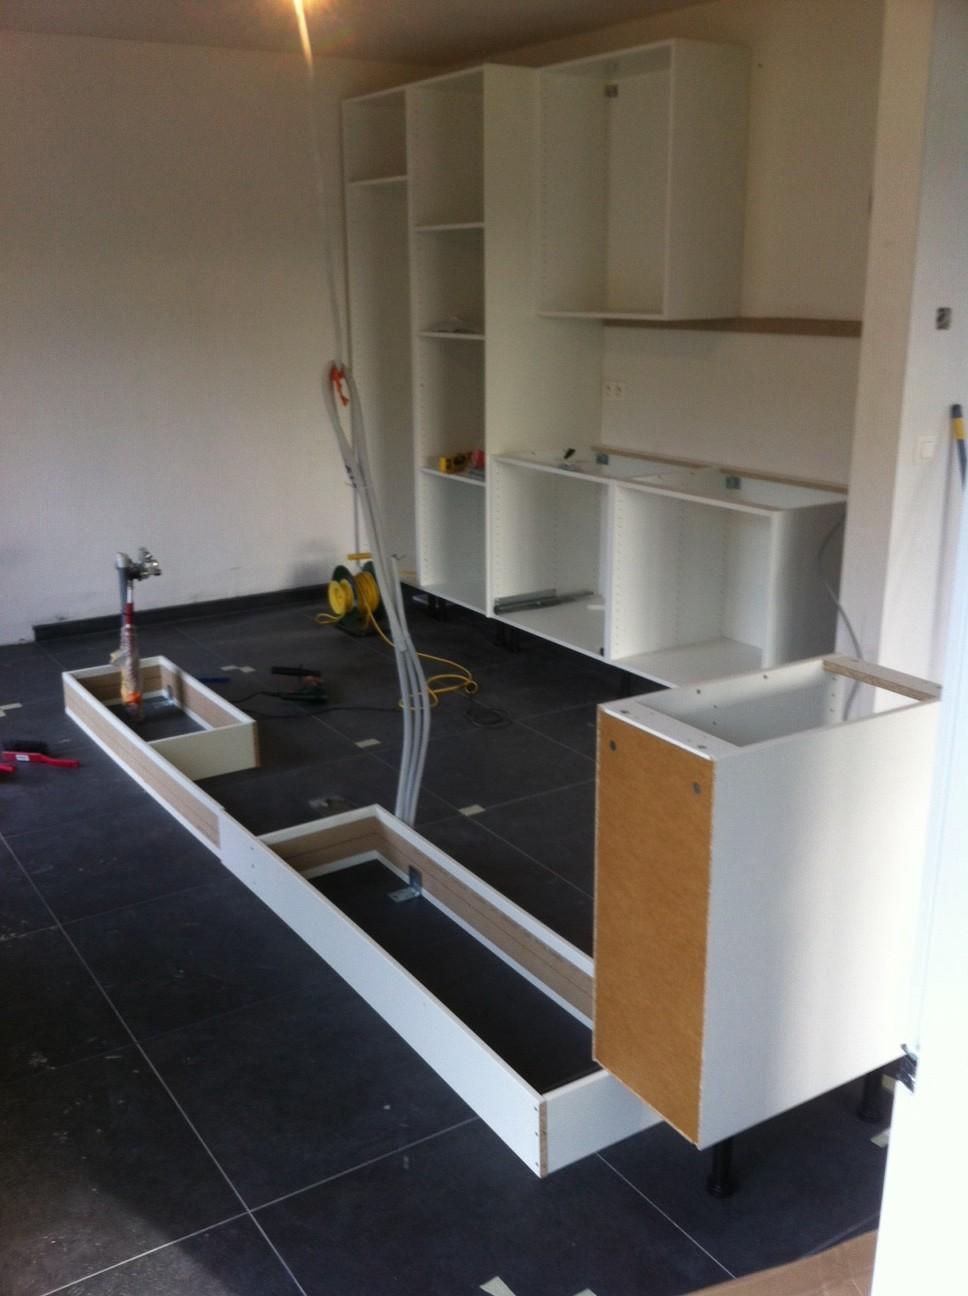 ilot cuisine ikea montage. Black Bedroom Furniture Sets. Home Design Ideas